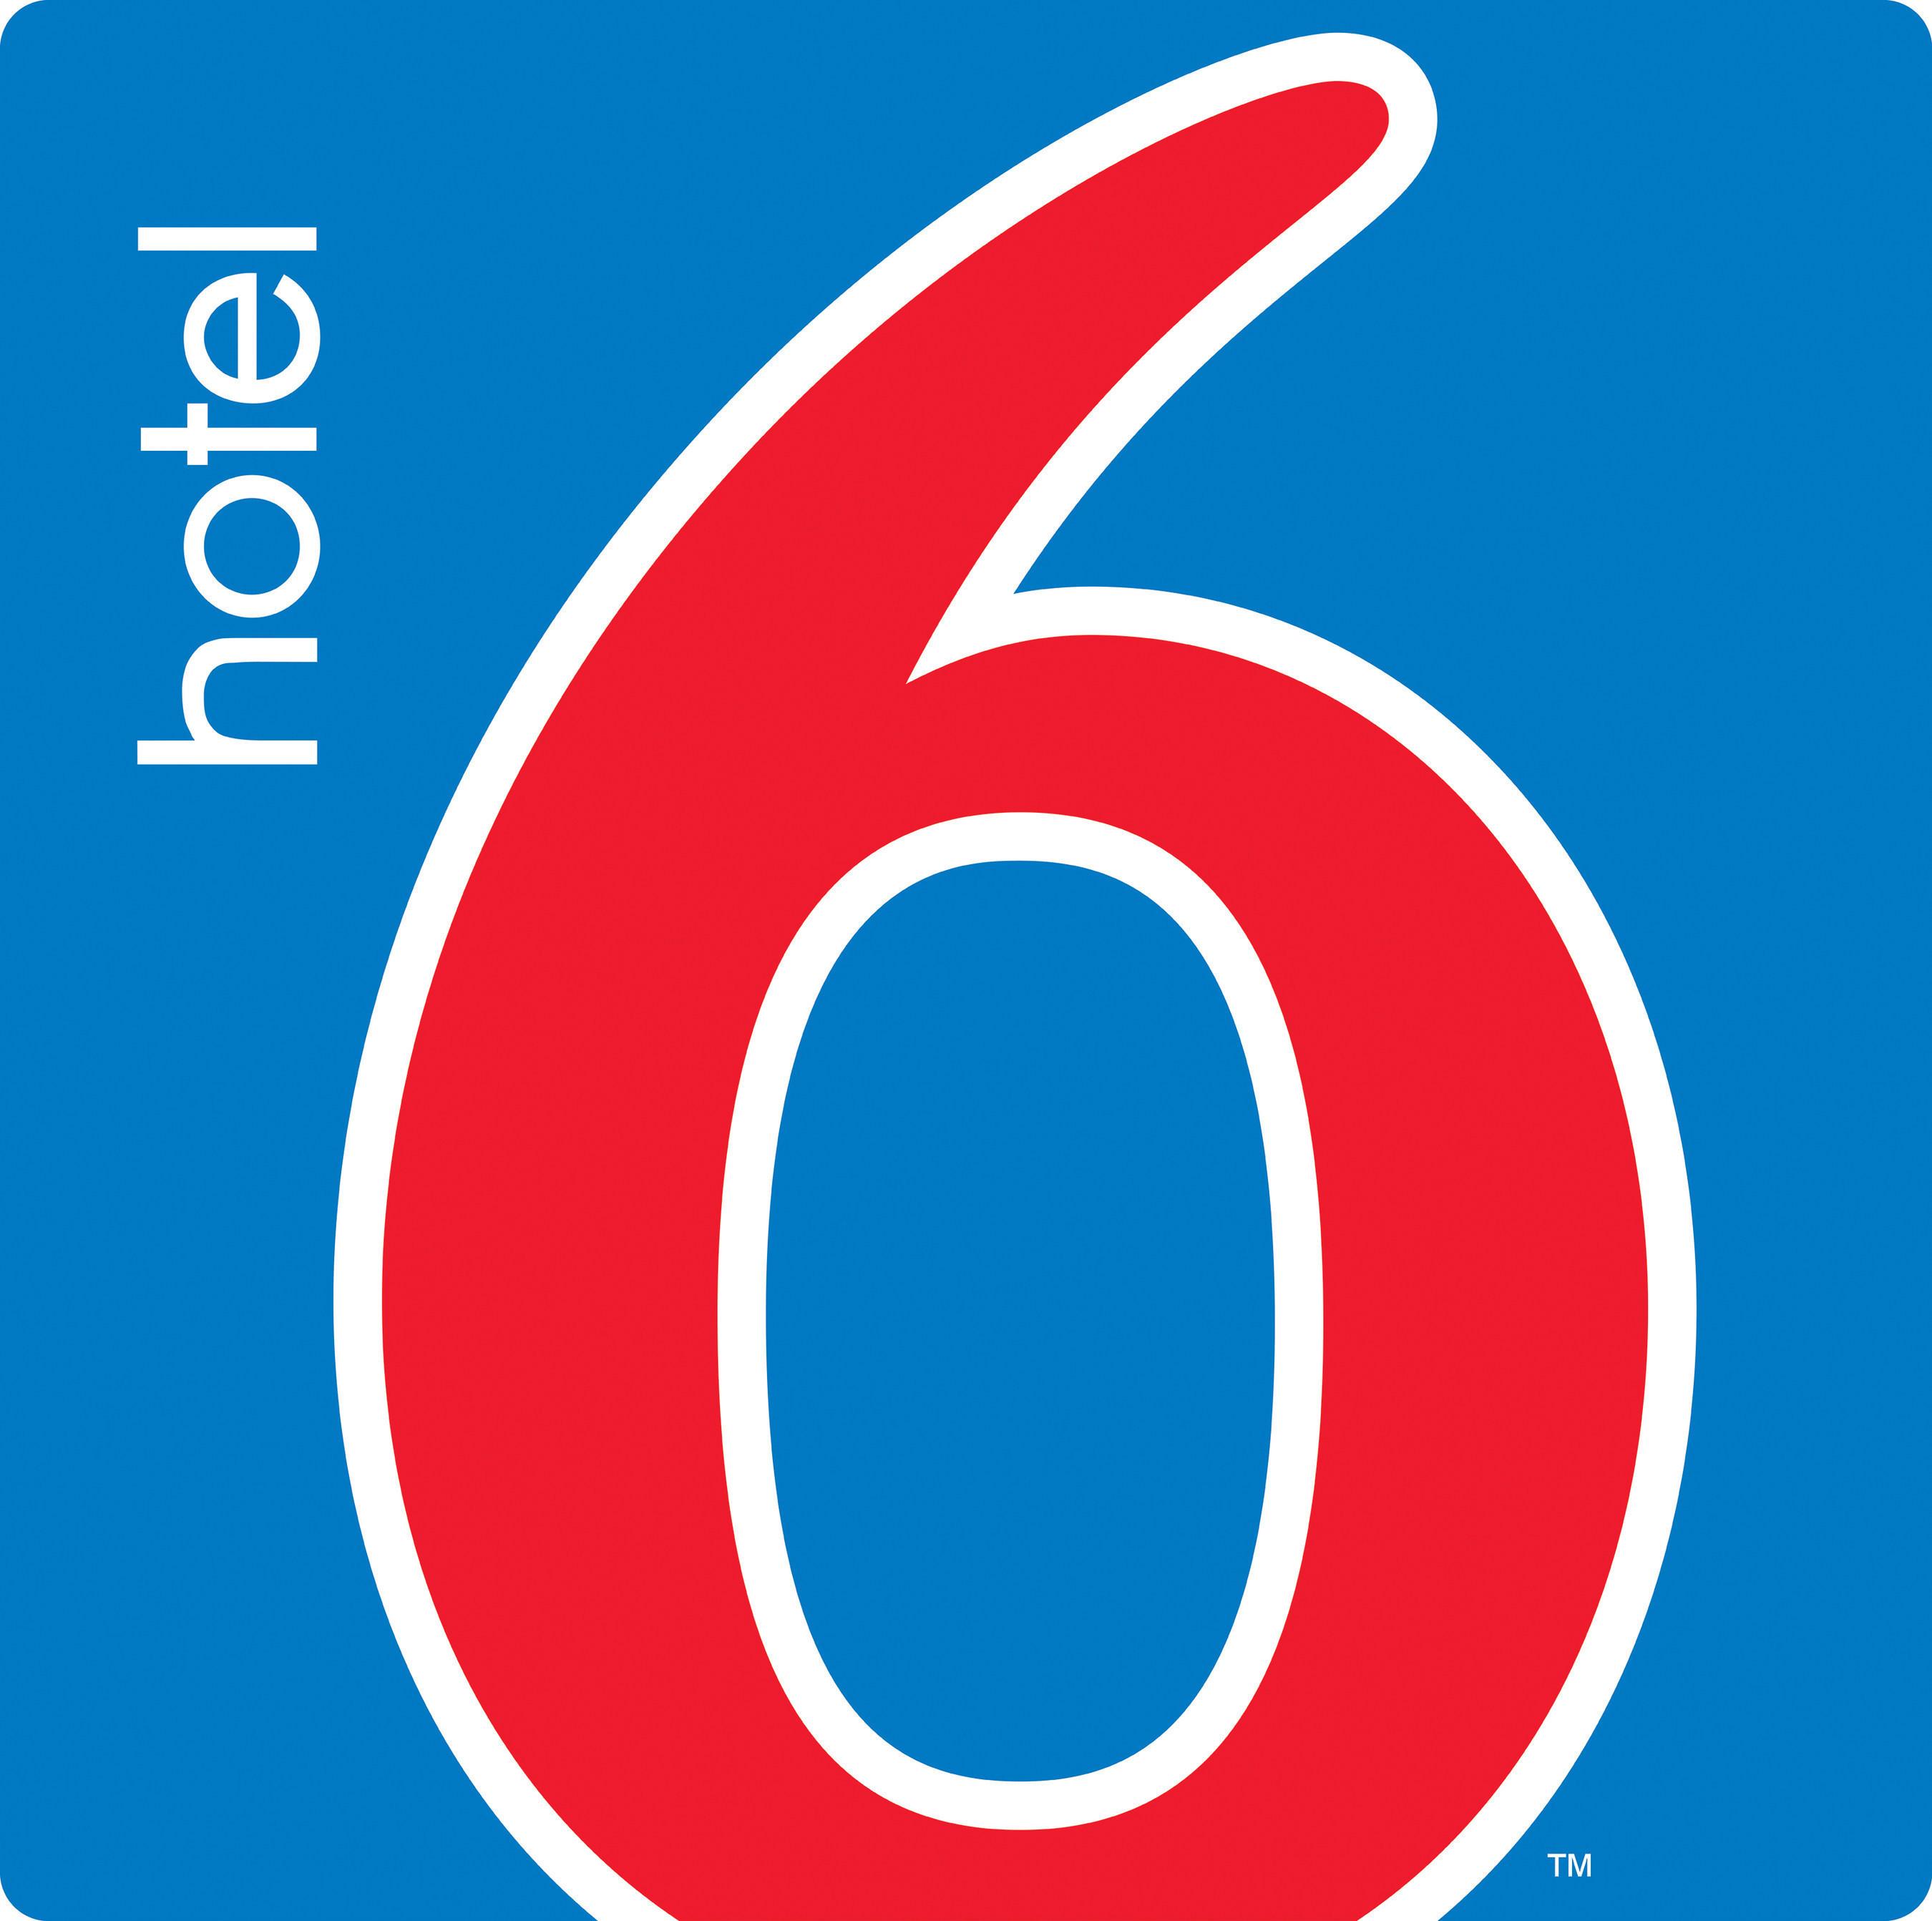 Hotel 6 logo